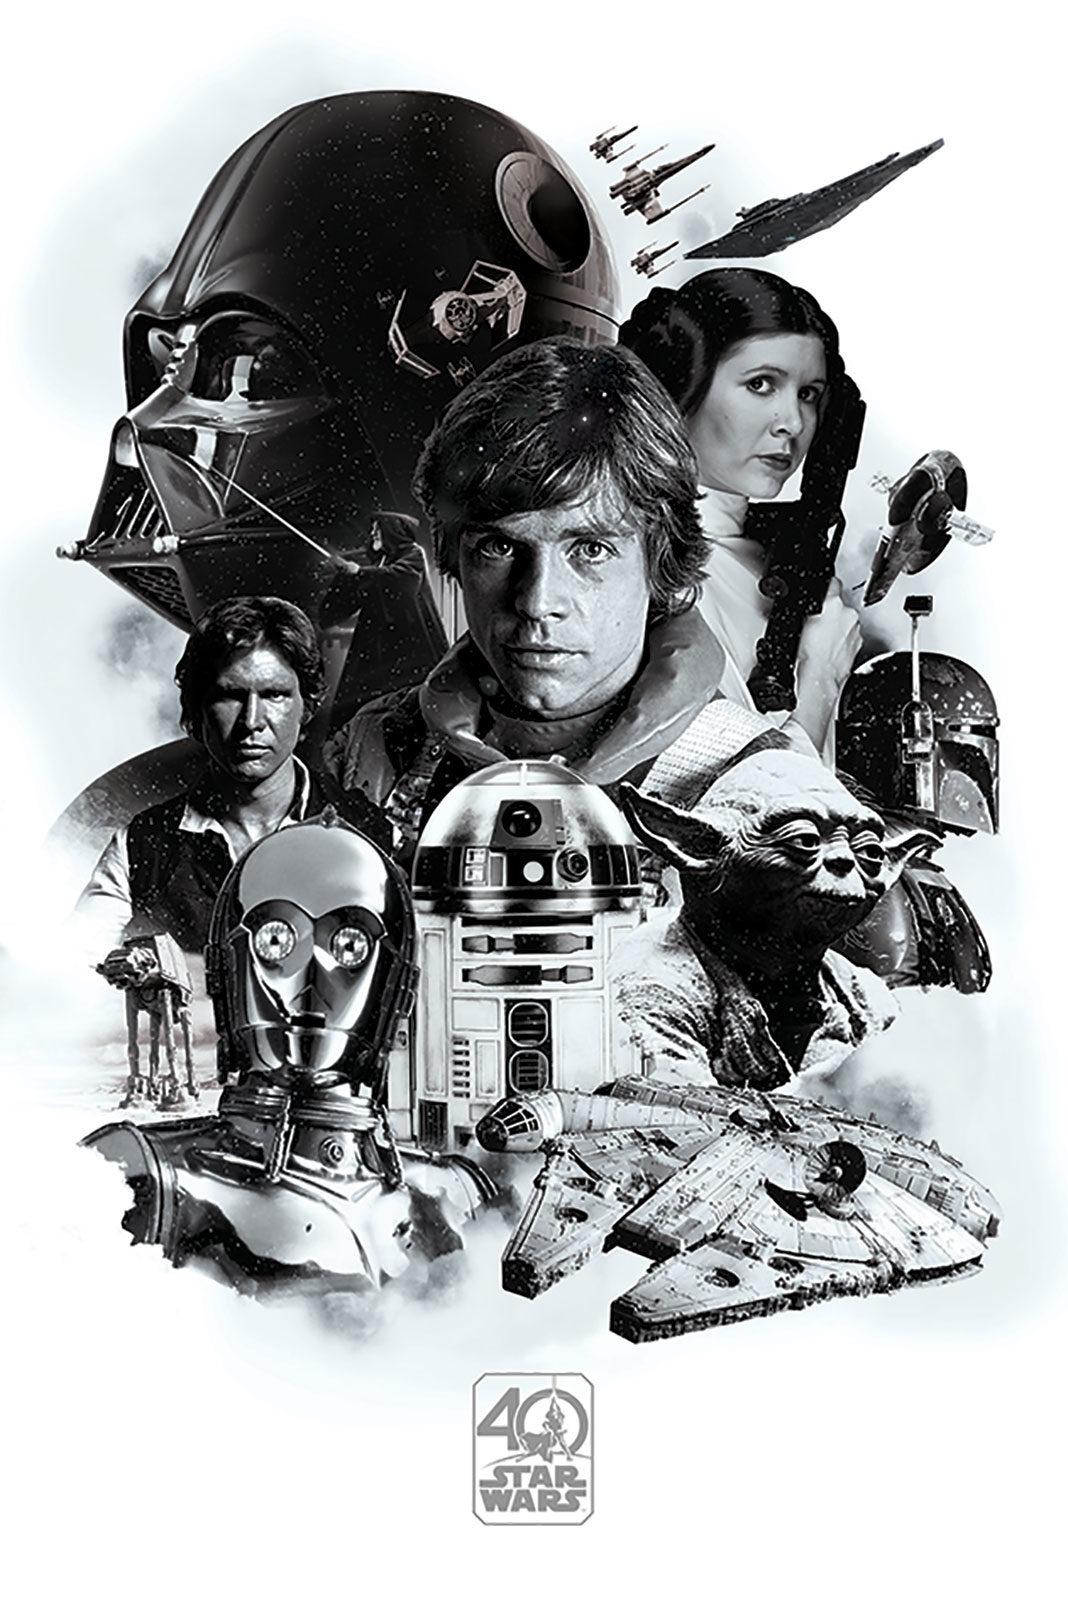 Plakaty Filmowe Star Wars 40th Anniversary Plakat Filmowy